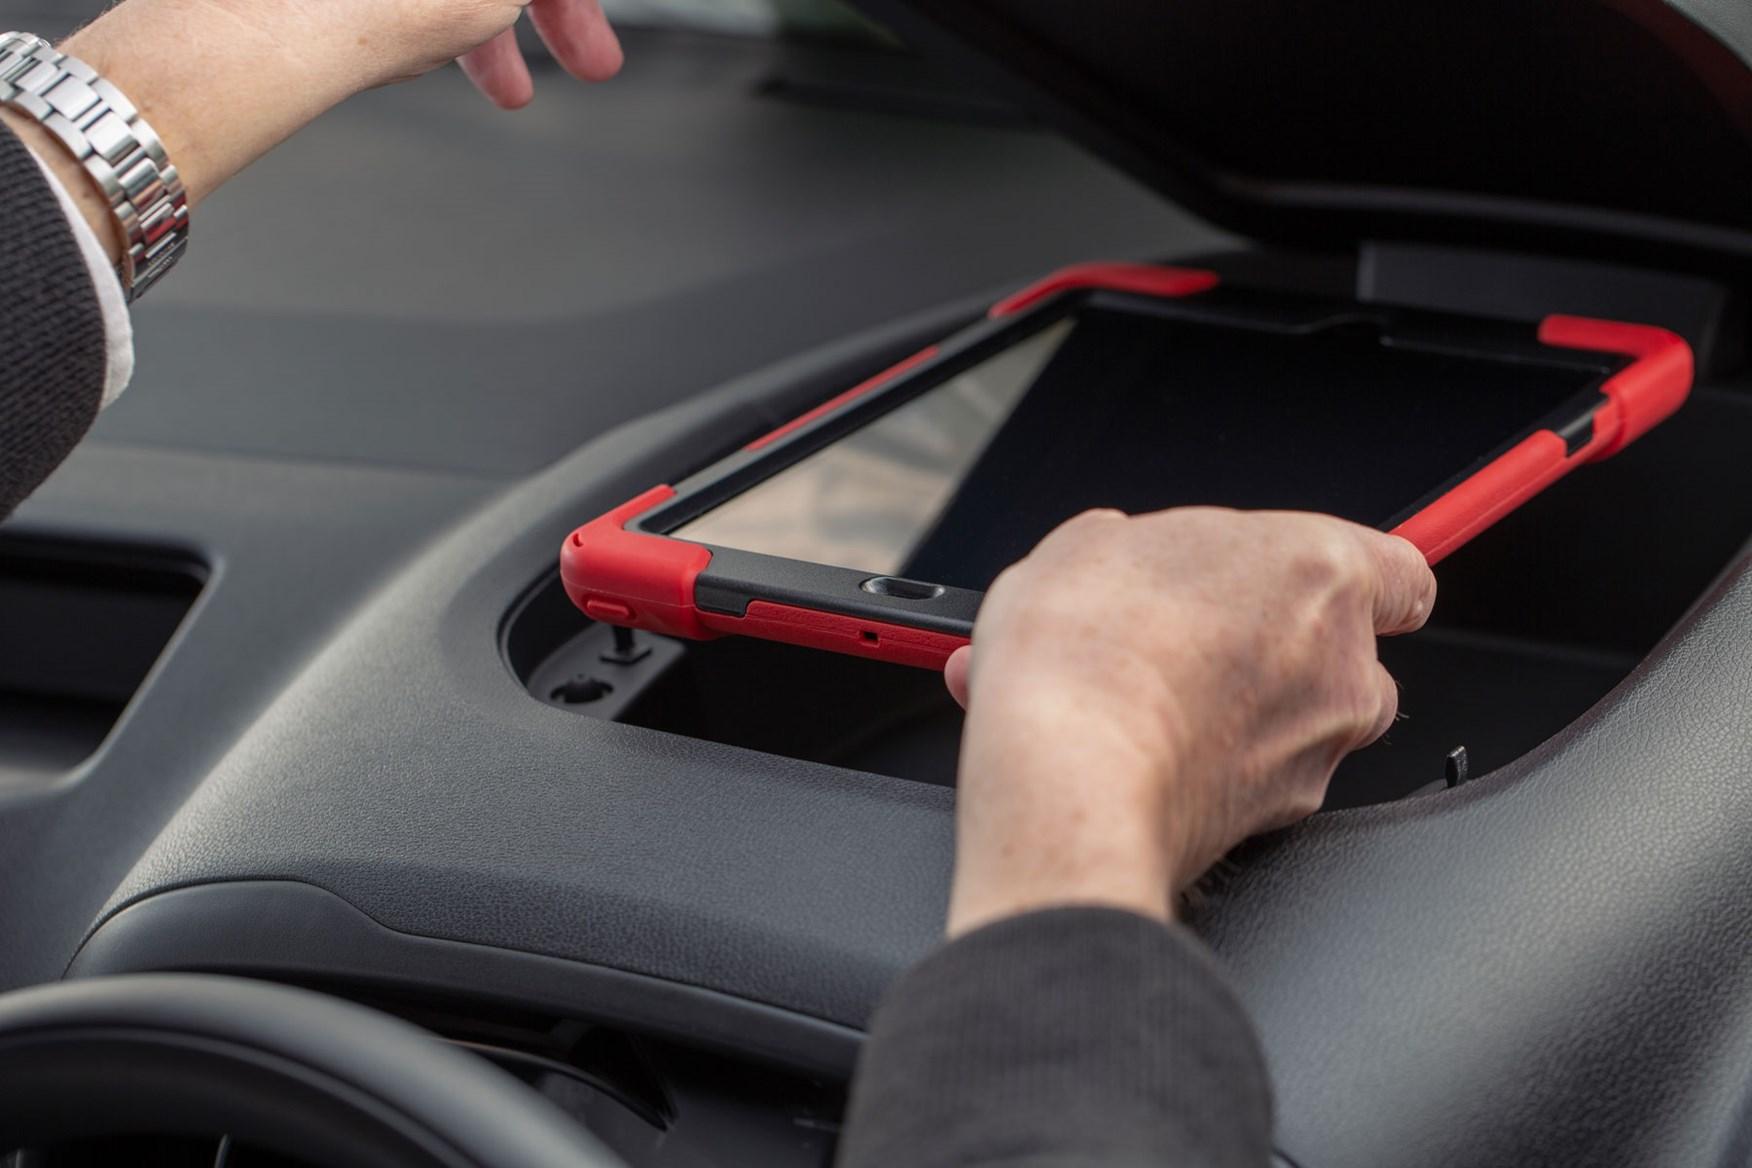 2020 Toyota Proace City review - cab interior, dash-top storage